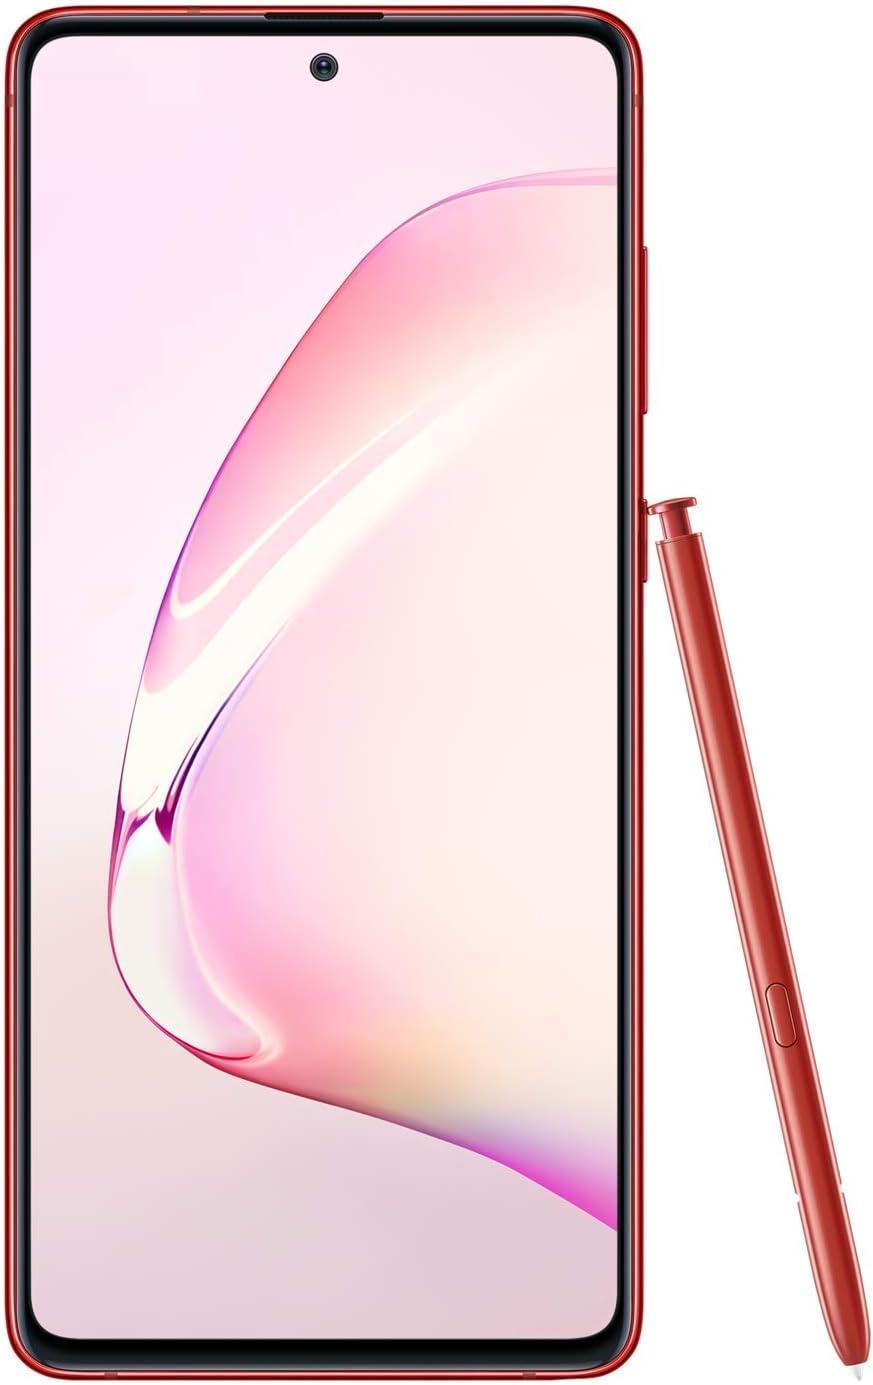 Samsung Galaxy Note 10 Lite 6GB/128GB Rojo (Aura Red) Dual SIM N770